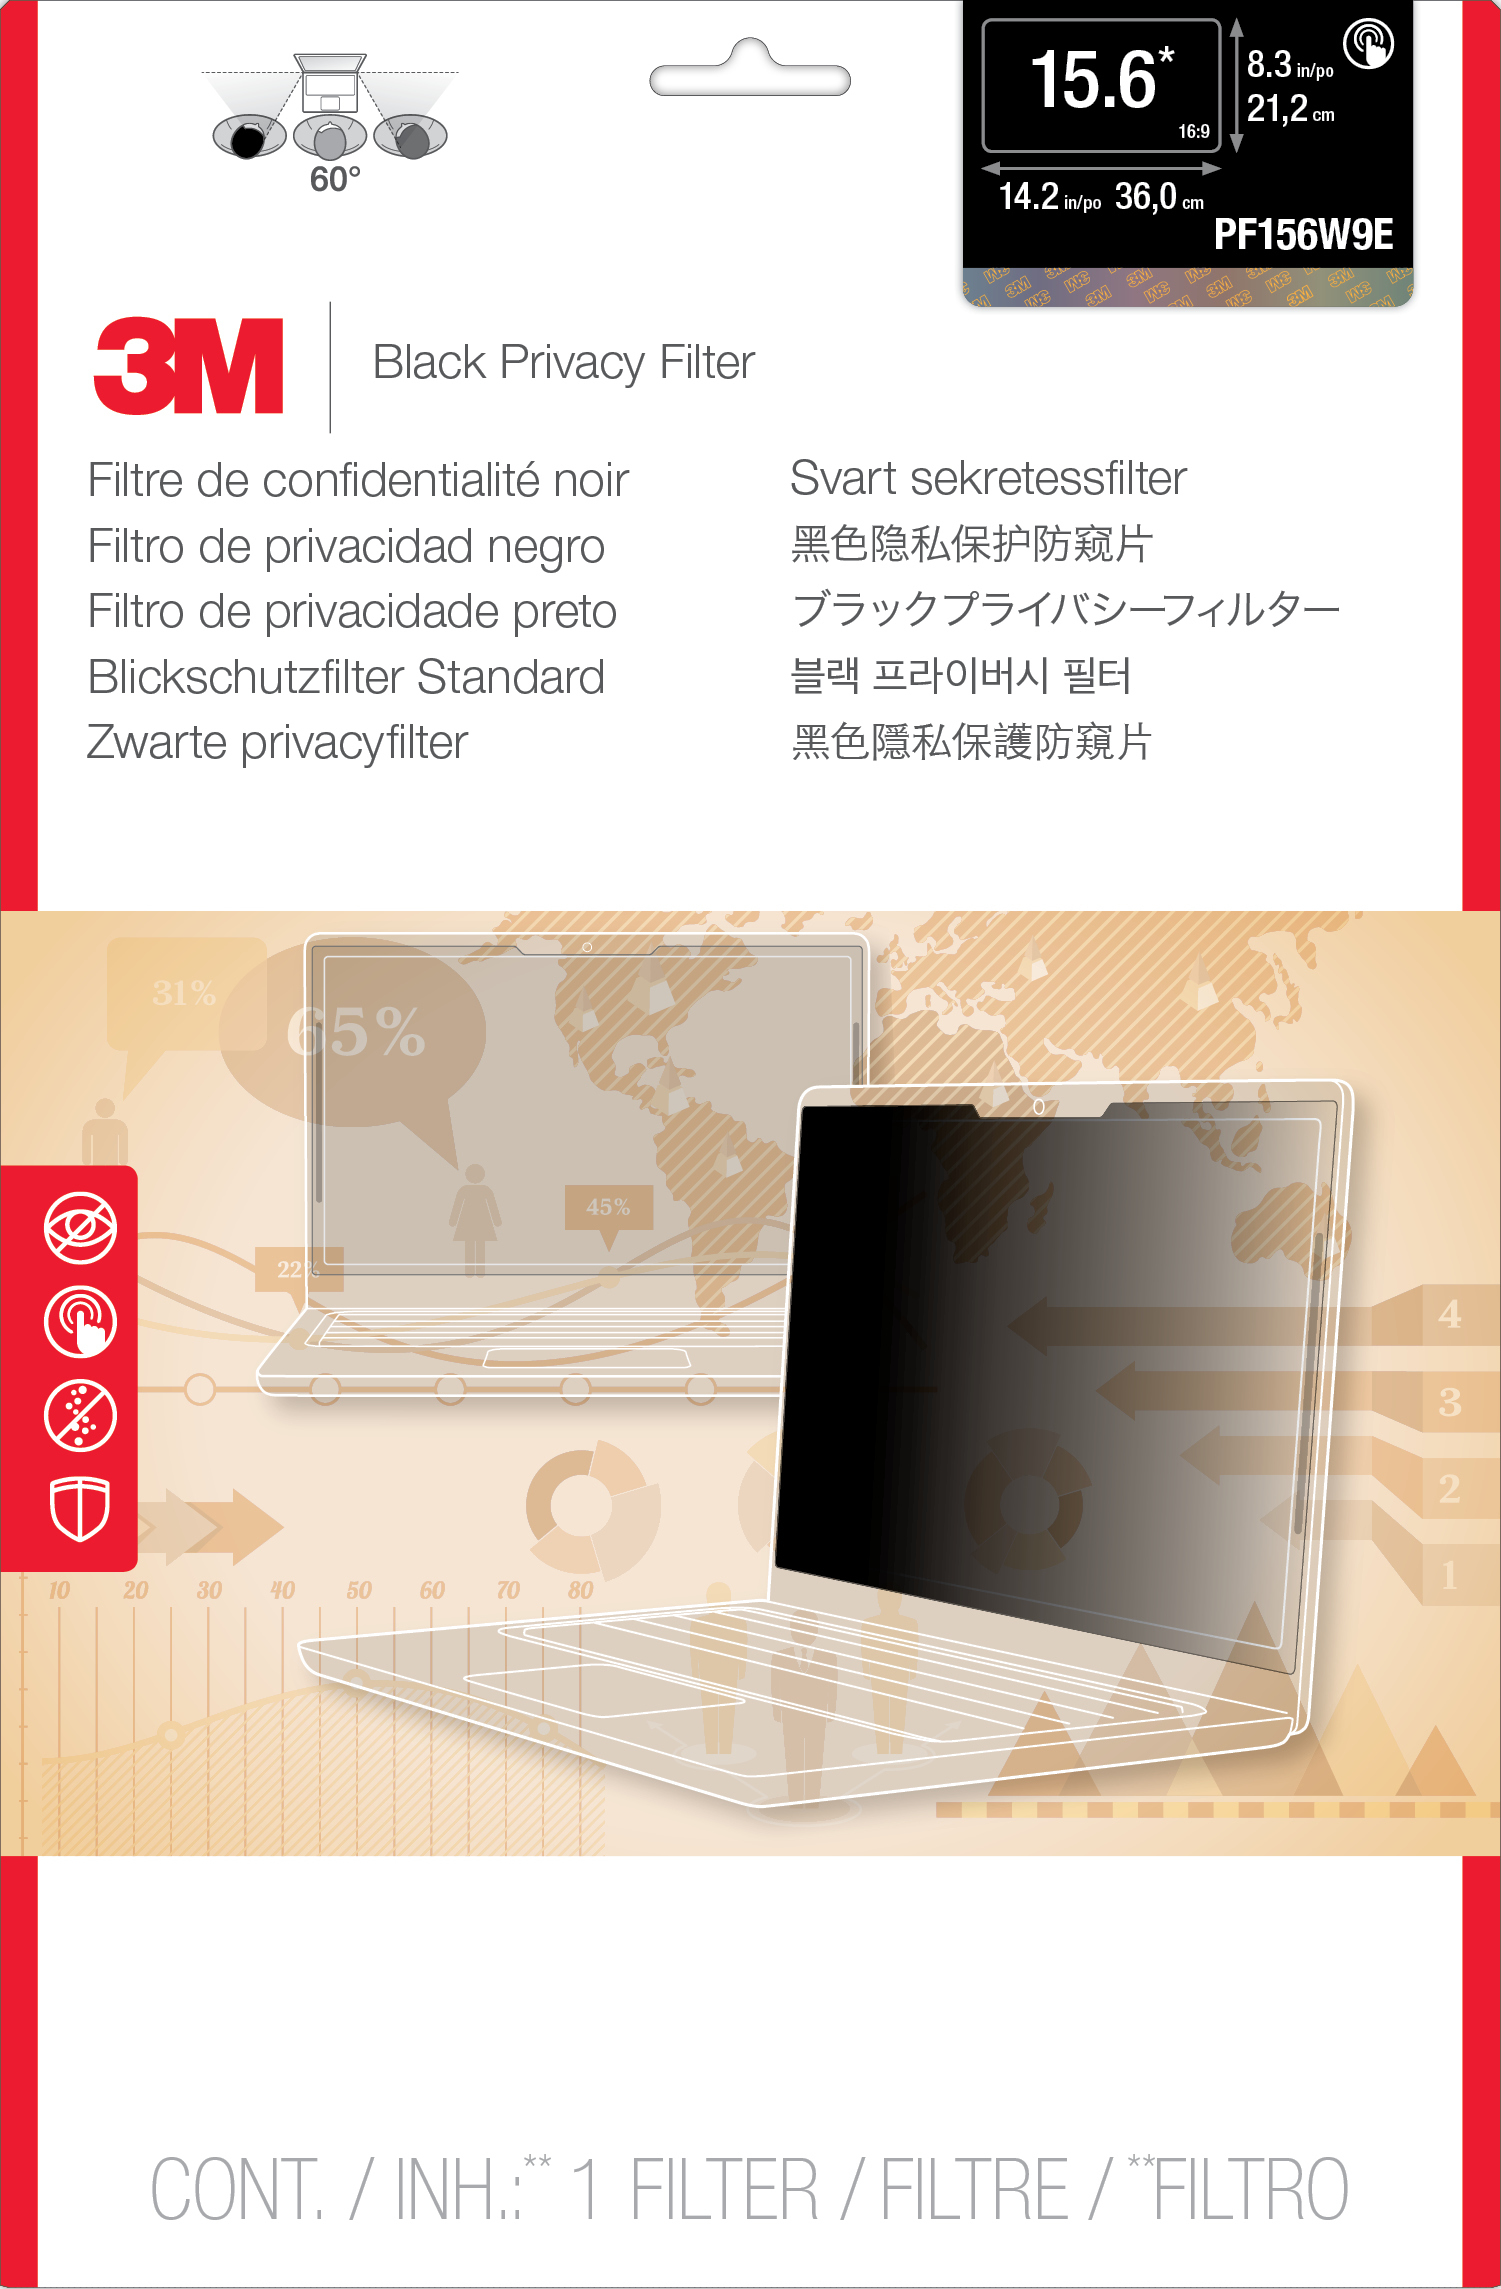 "3M PF156W9E Privacy Filter for Edge-to-Edge 15.6"" Widescreen Laptop"